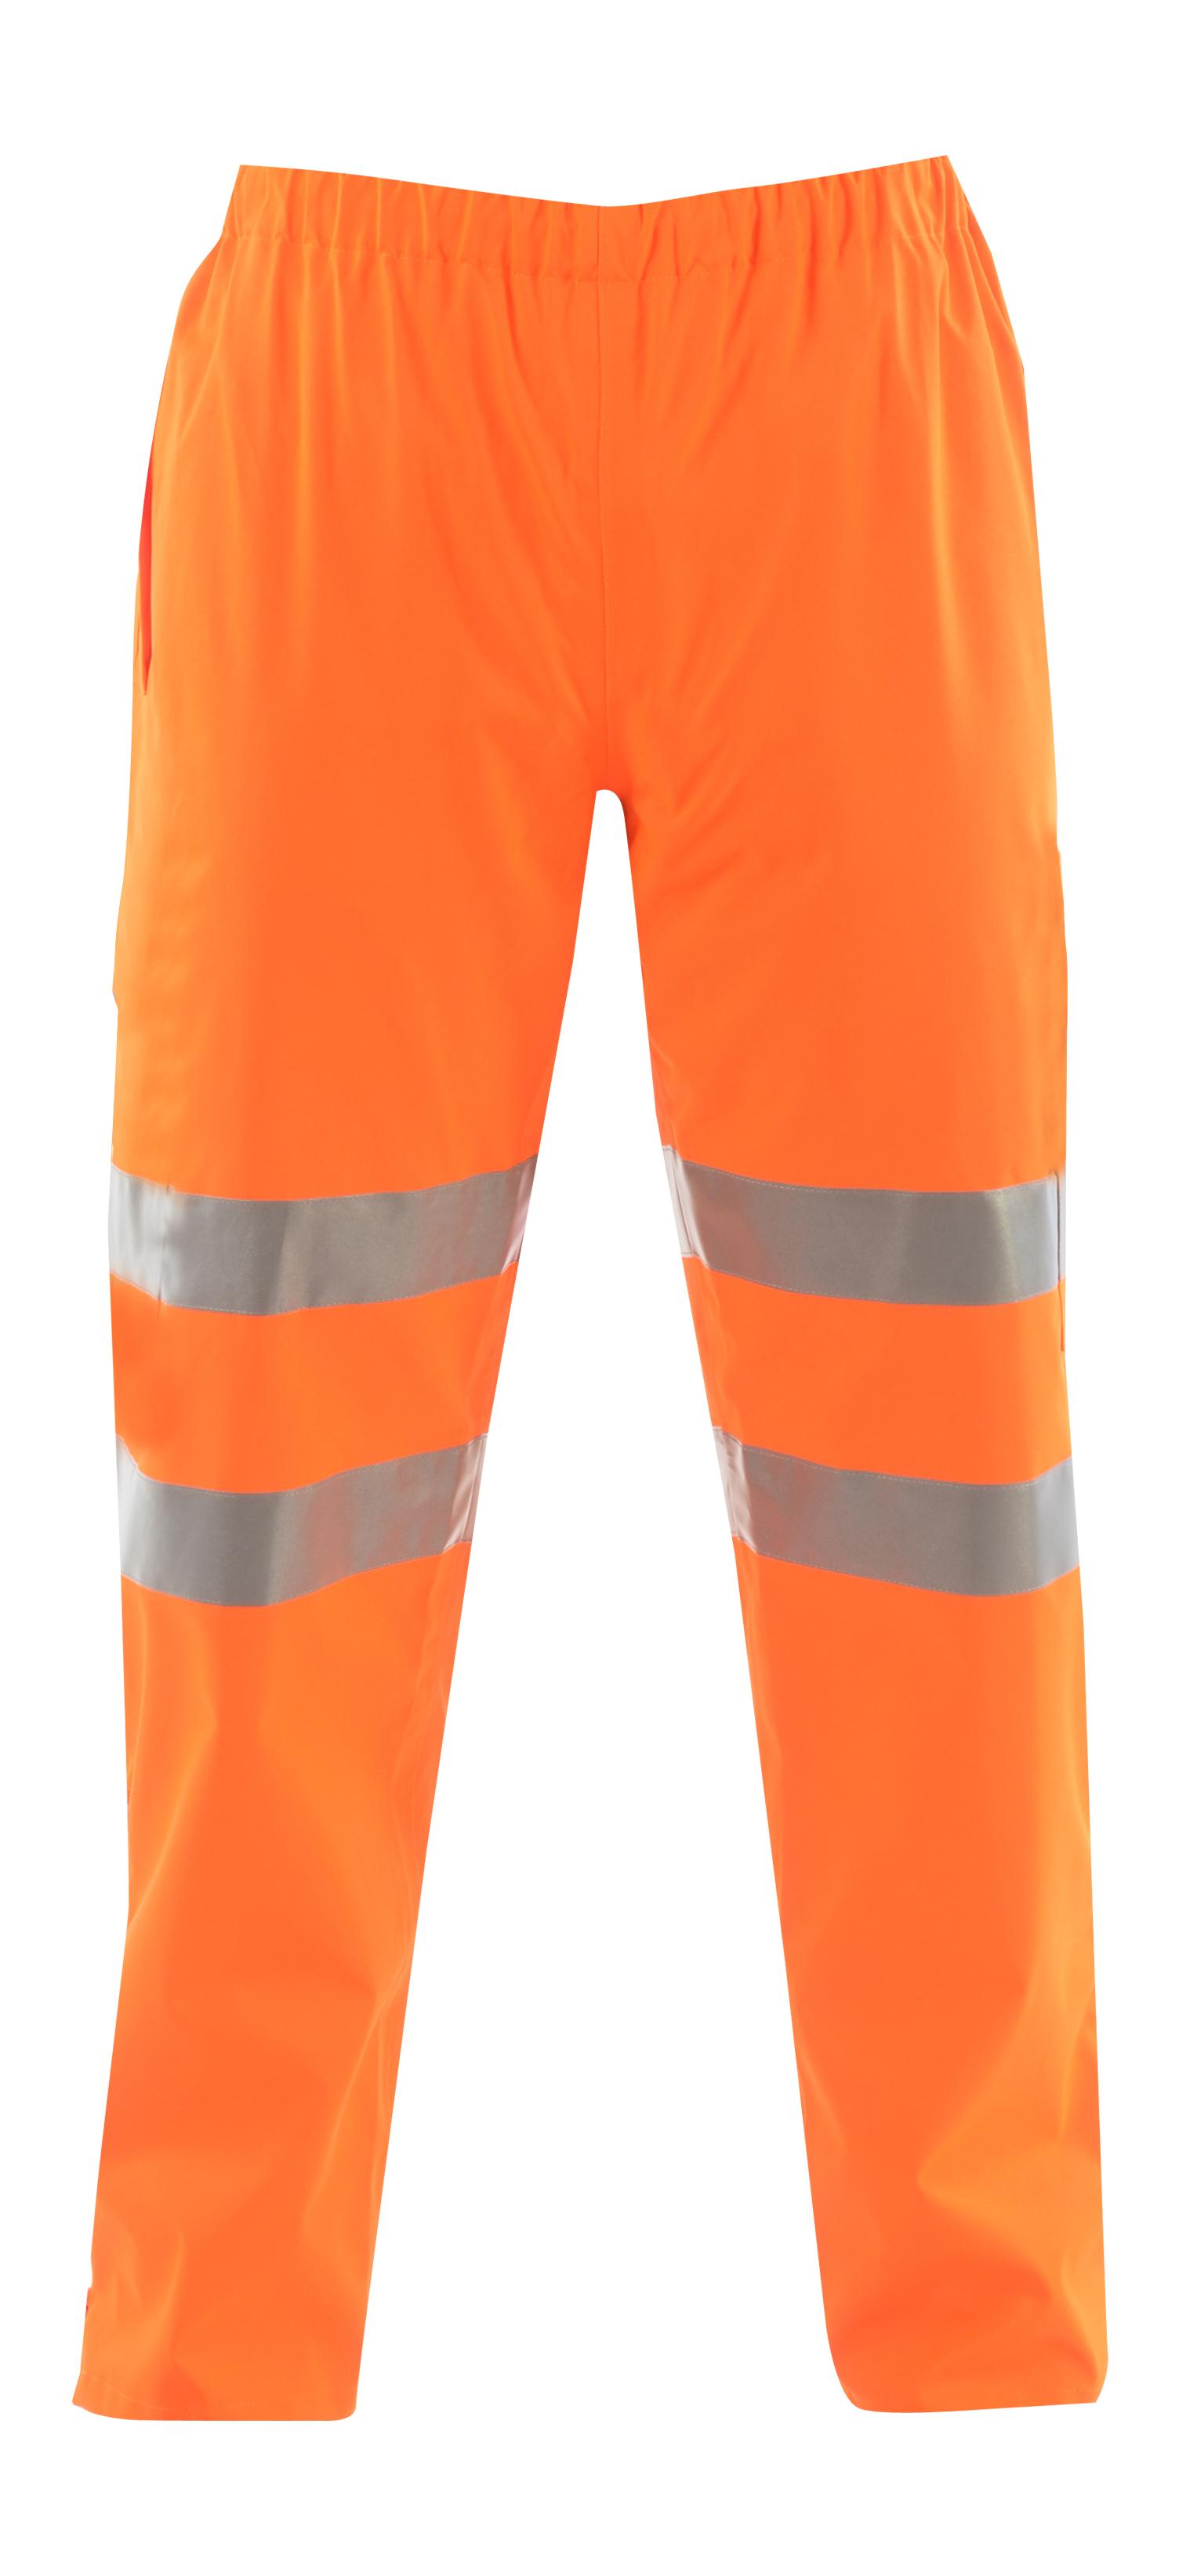 bodyguard-Heat-and-Flame-Resistant-Hi-Vis-Orange-Flame-Retardant-Trousers